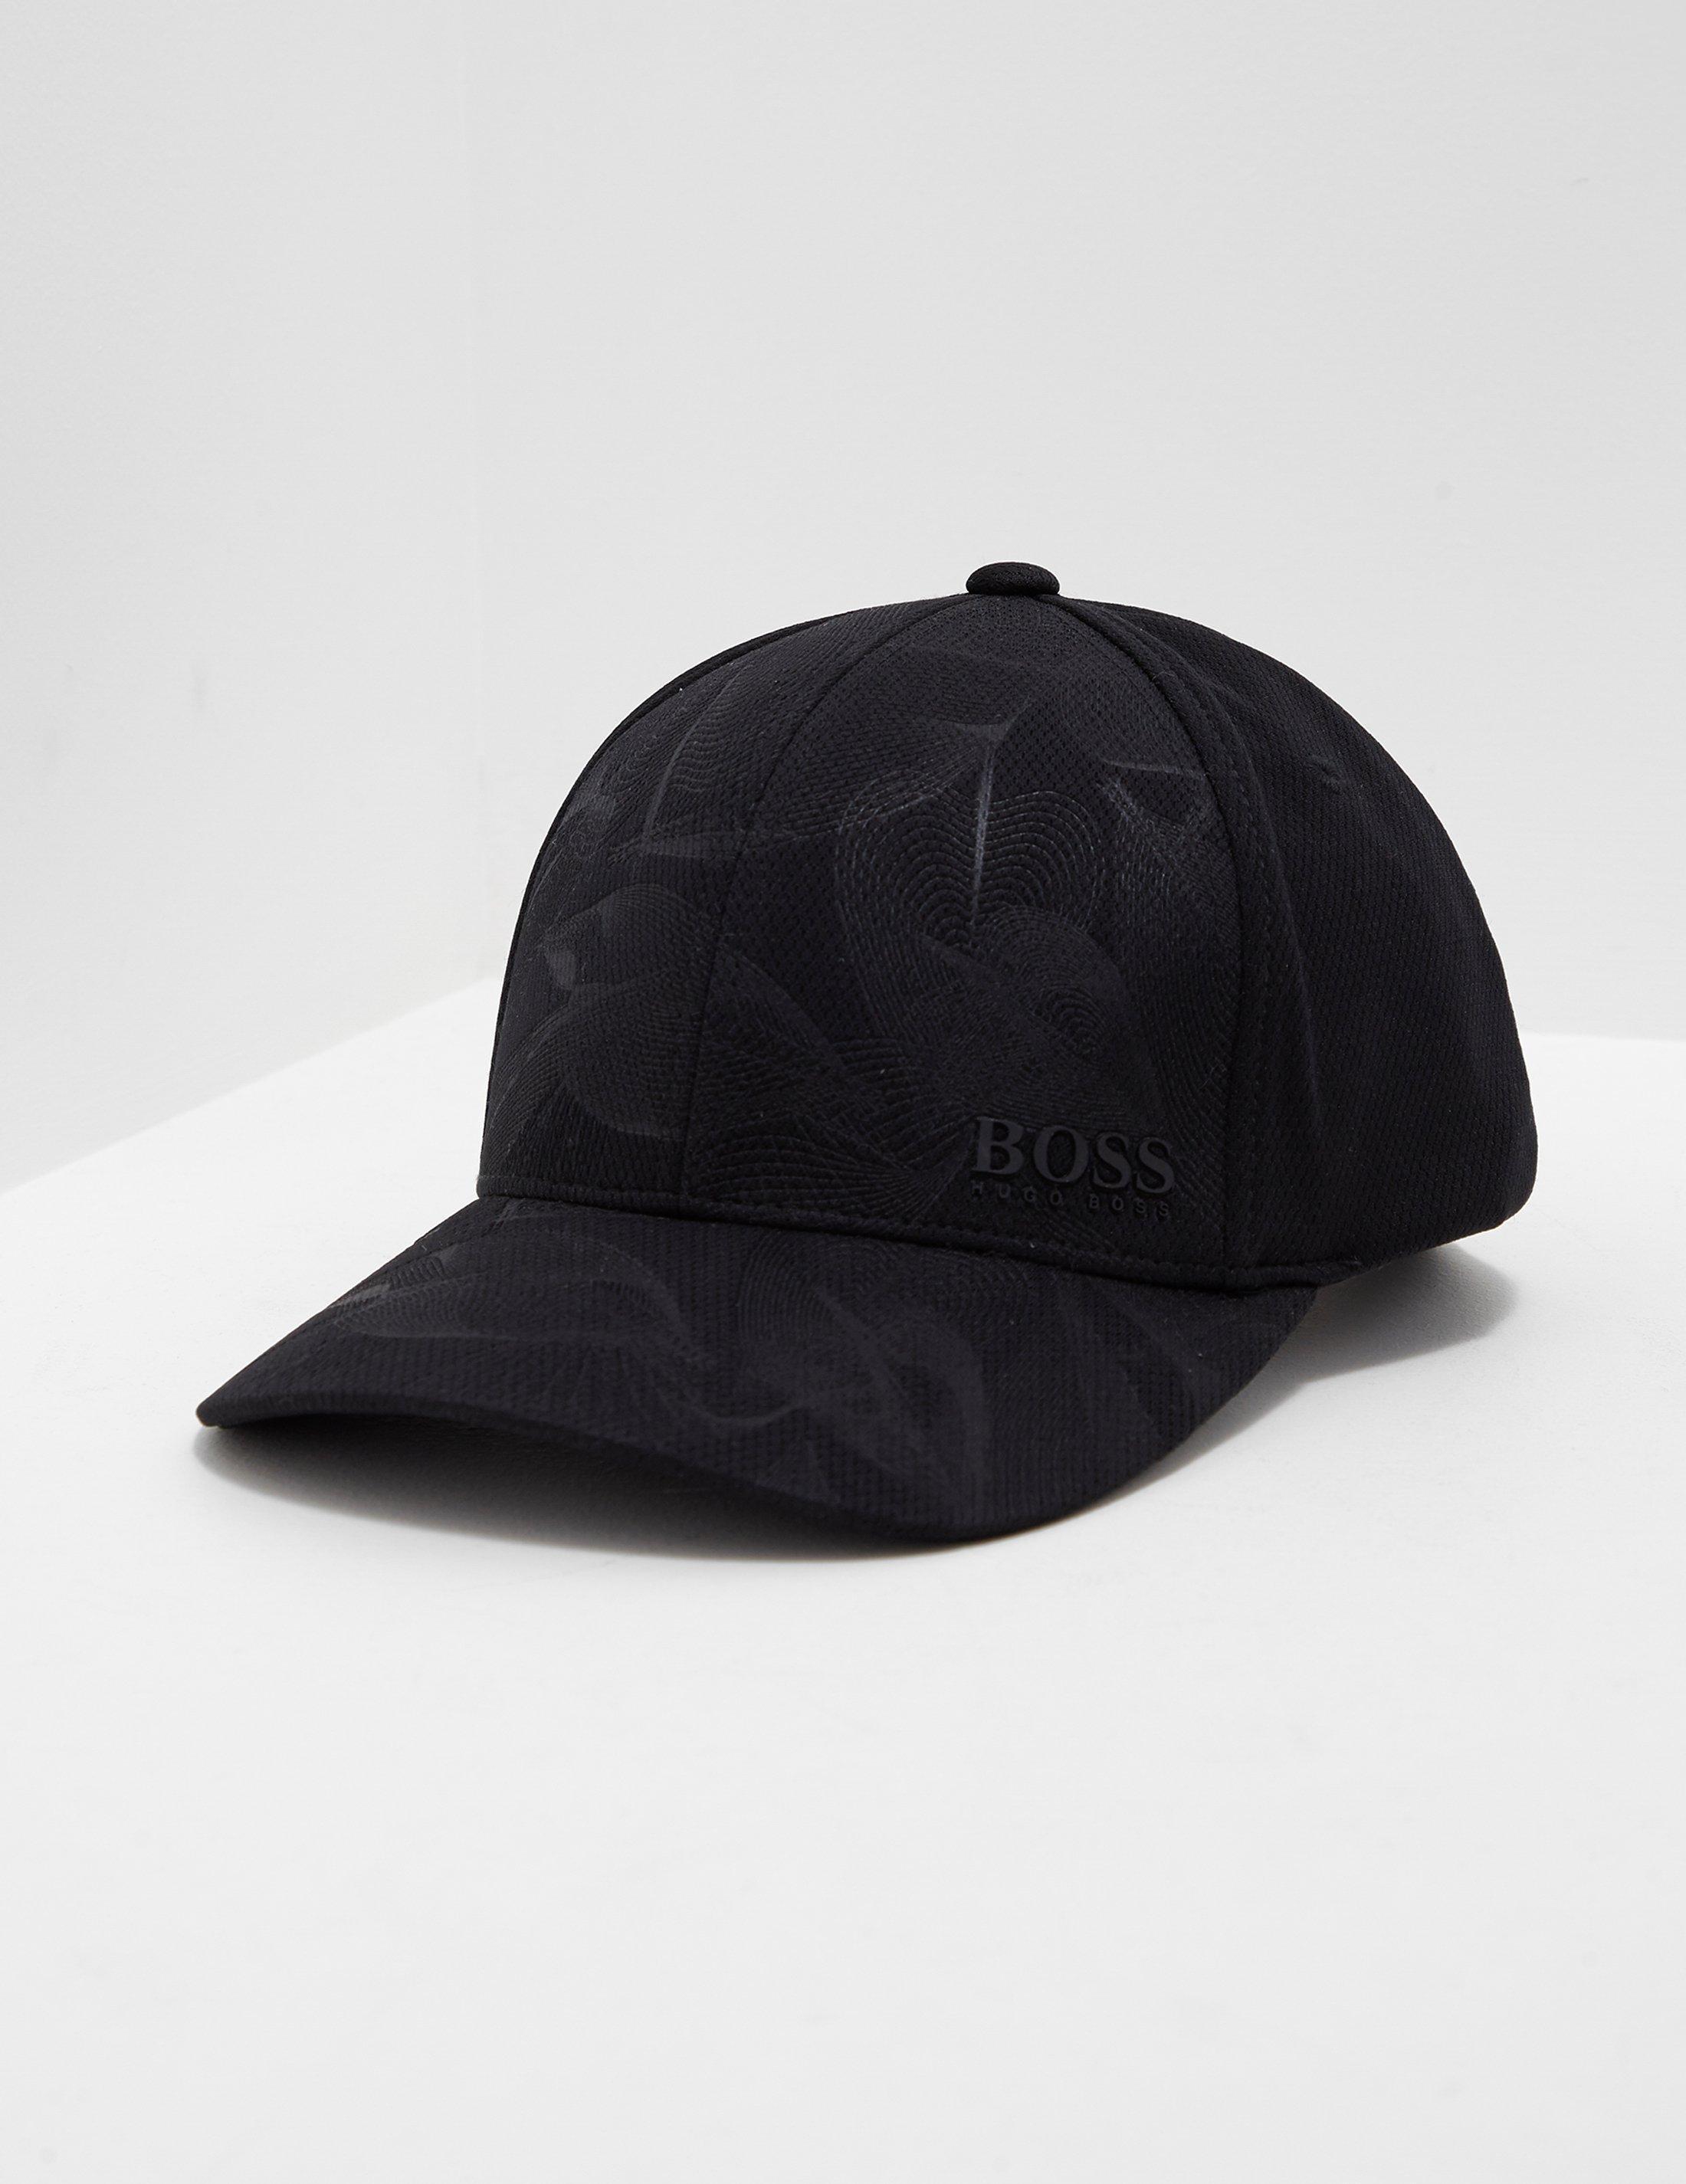 5a7ea889b6b Lyst - BOSS Mens Poly Print Cap Black in Black for Men